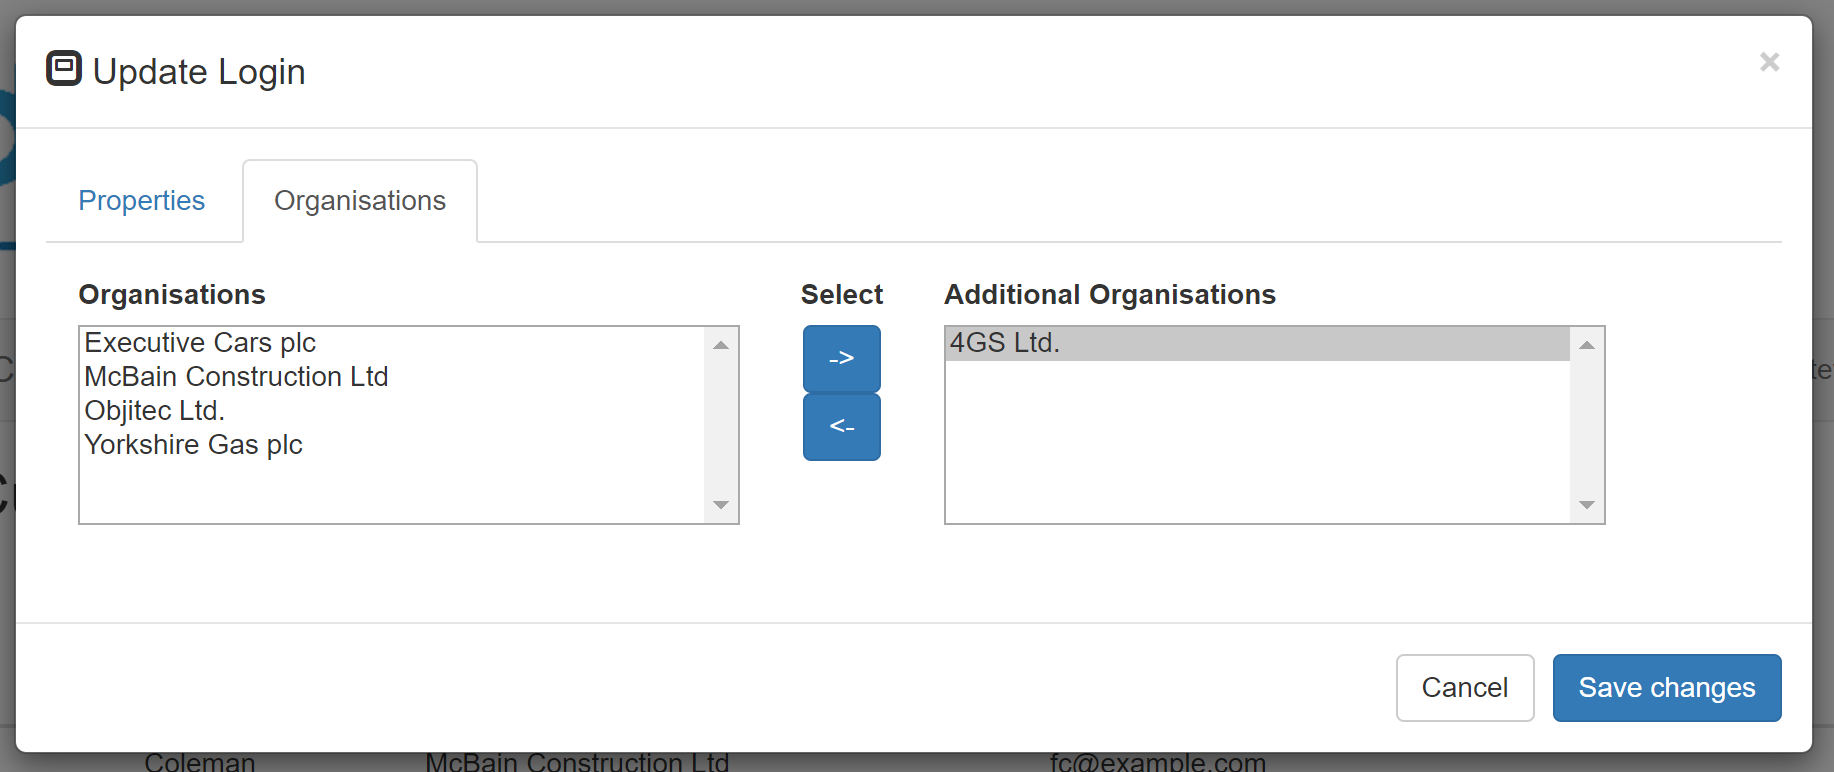 exec car adding an additional organisation